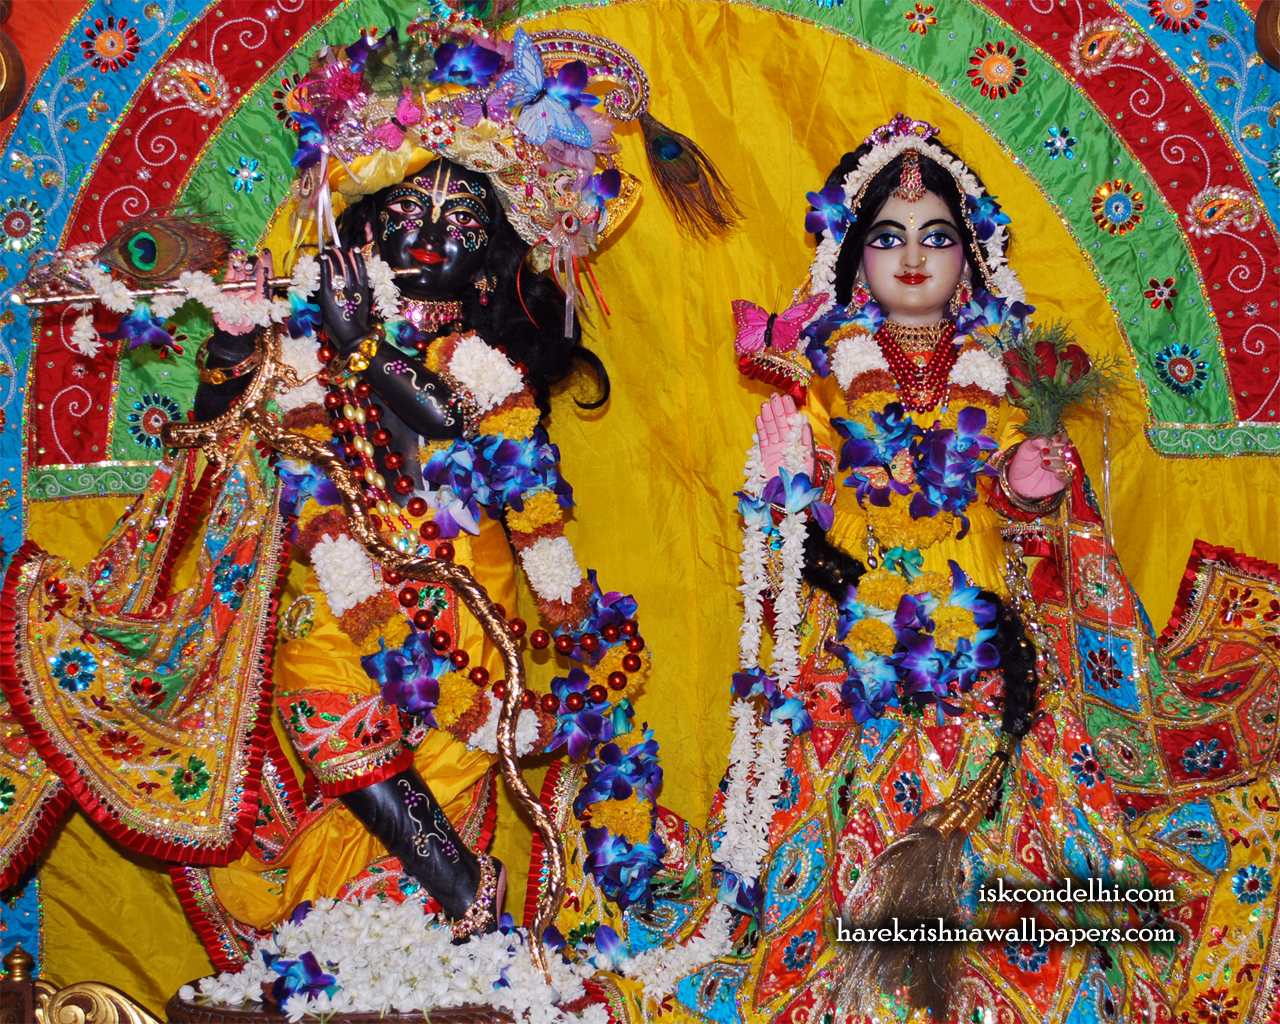 Sri Sri Radha Parthasarathi Wallpaper (012) Size 1280x1024 Download